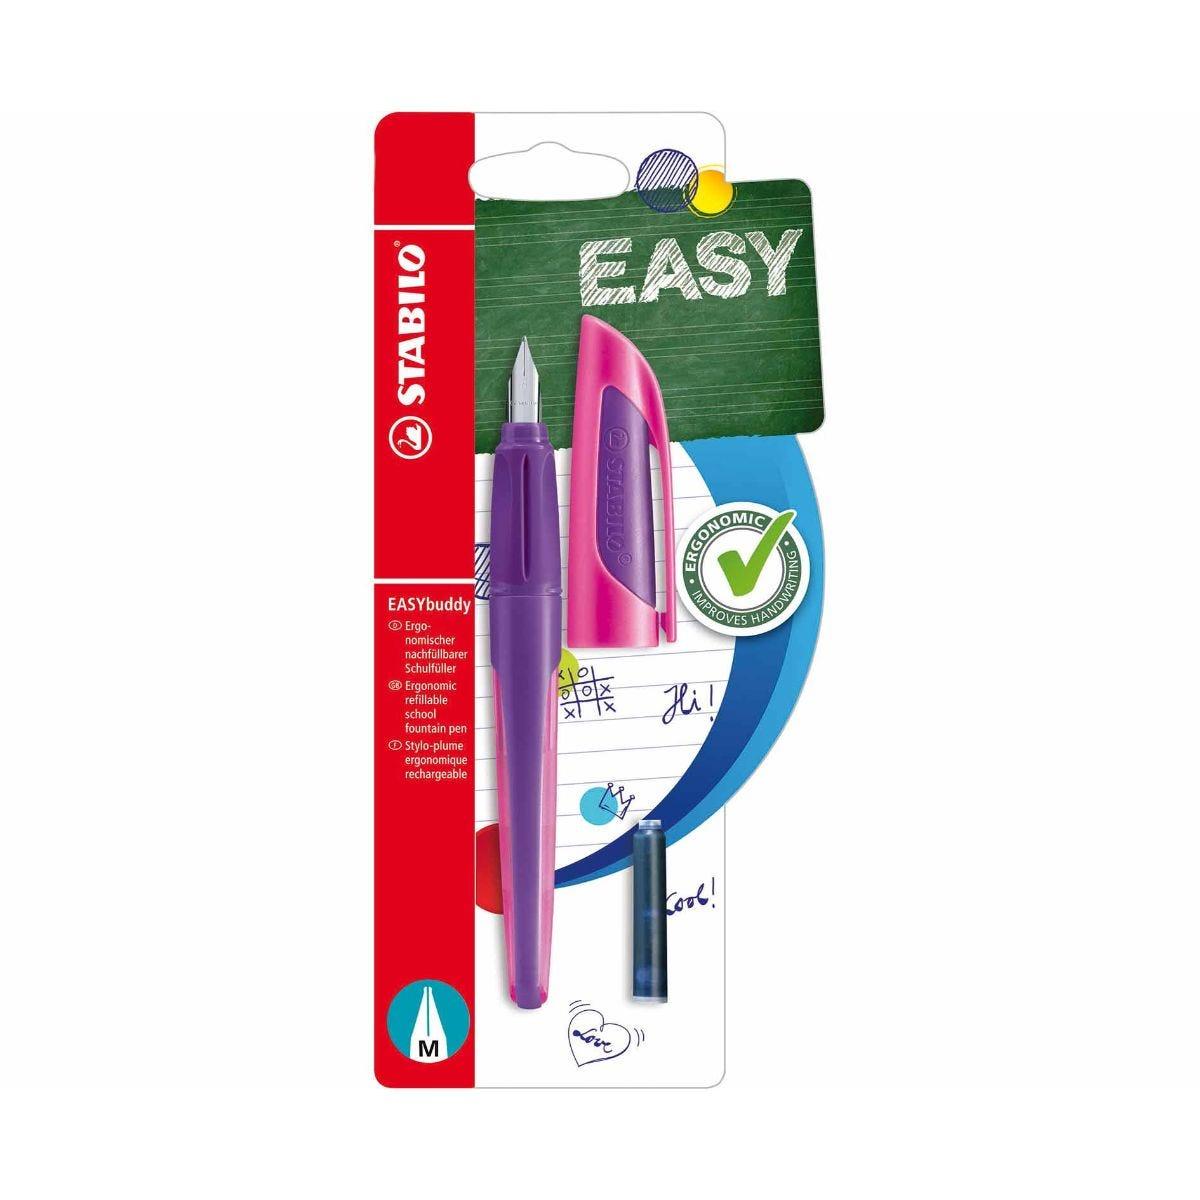 Fountain Pen Buy Pens Ryman Ballpoint Tip Refill And Diagram